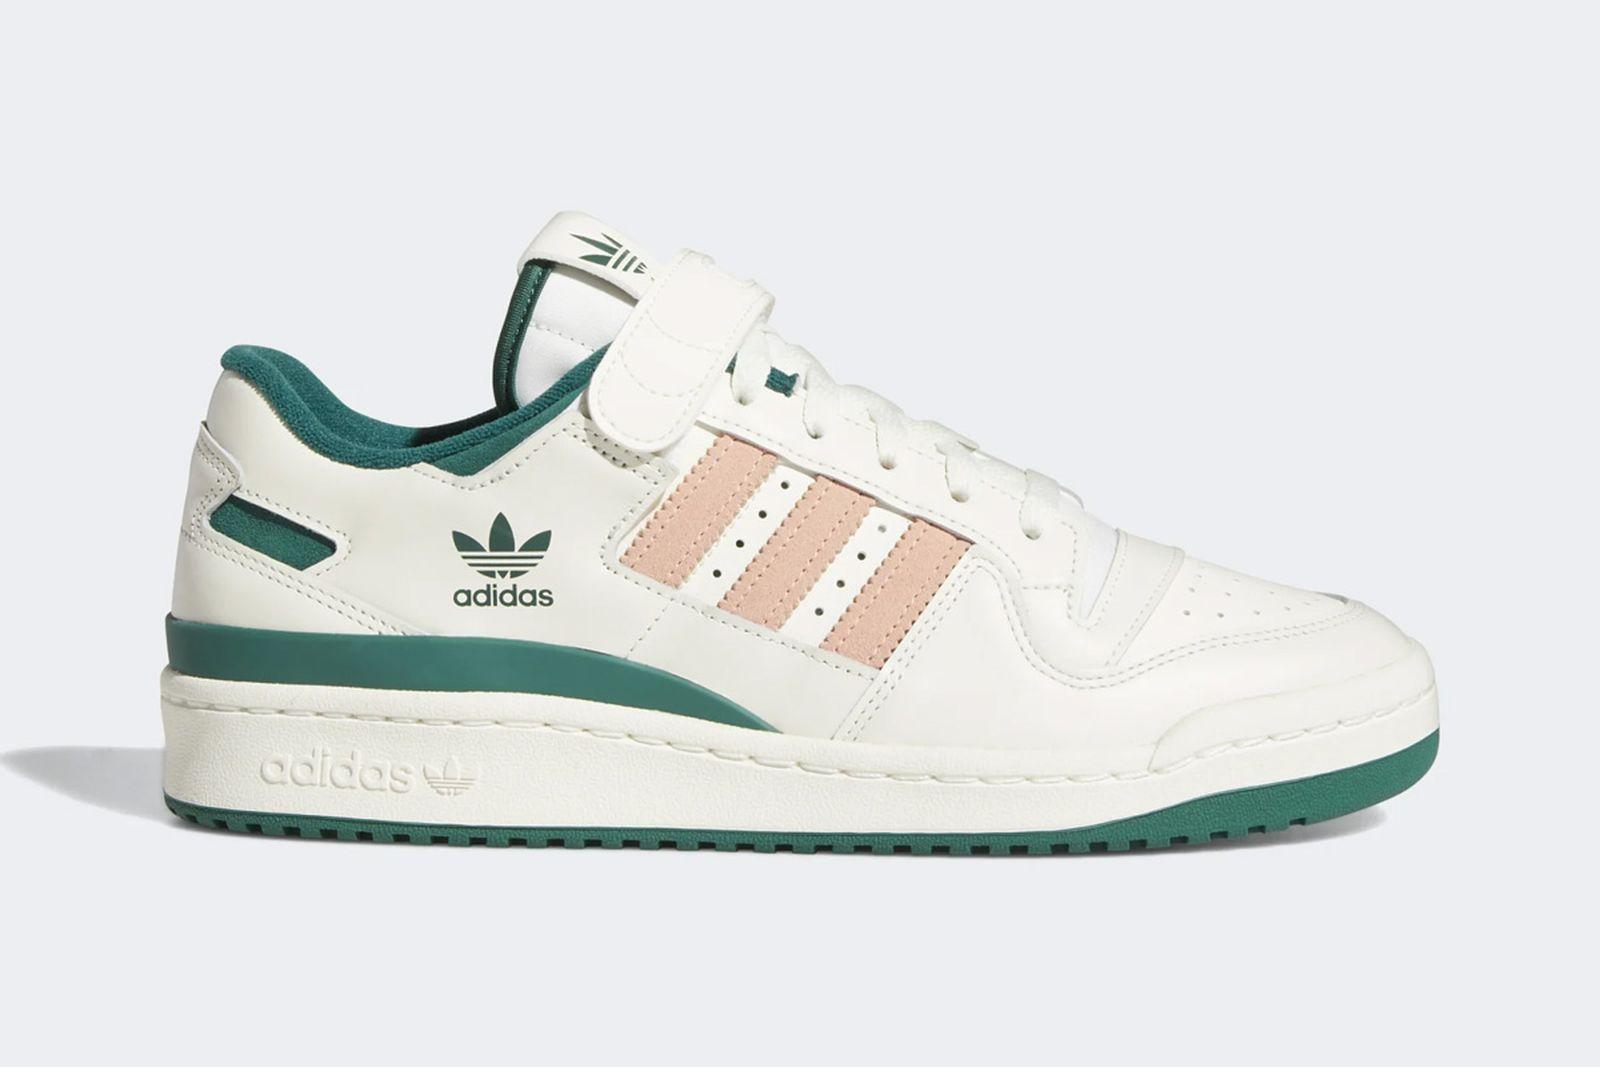 adidas-originals-forum-low-watermelon-release-date-price-02